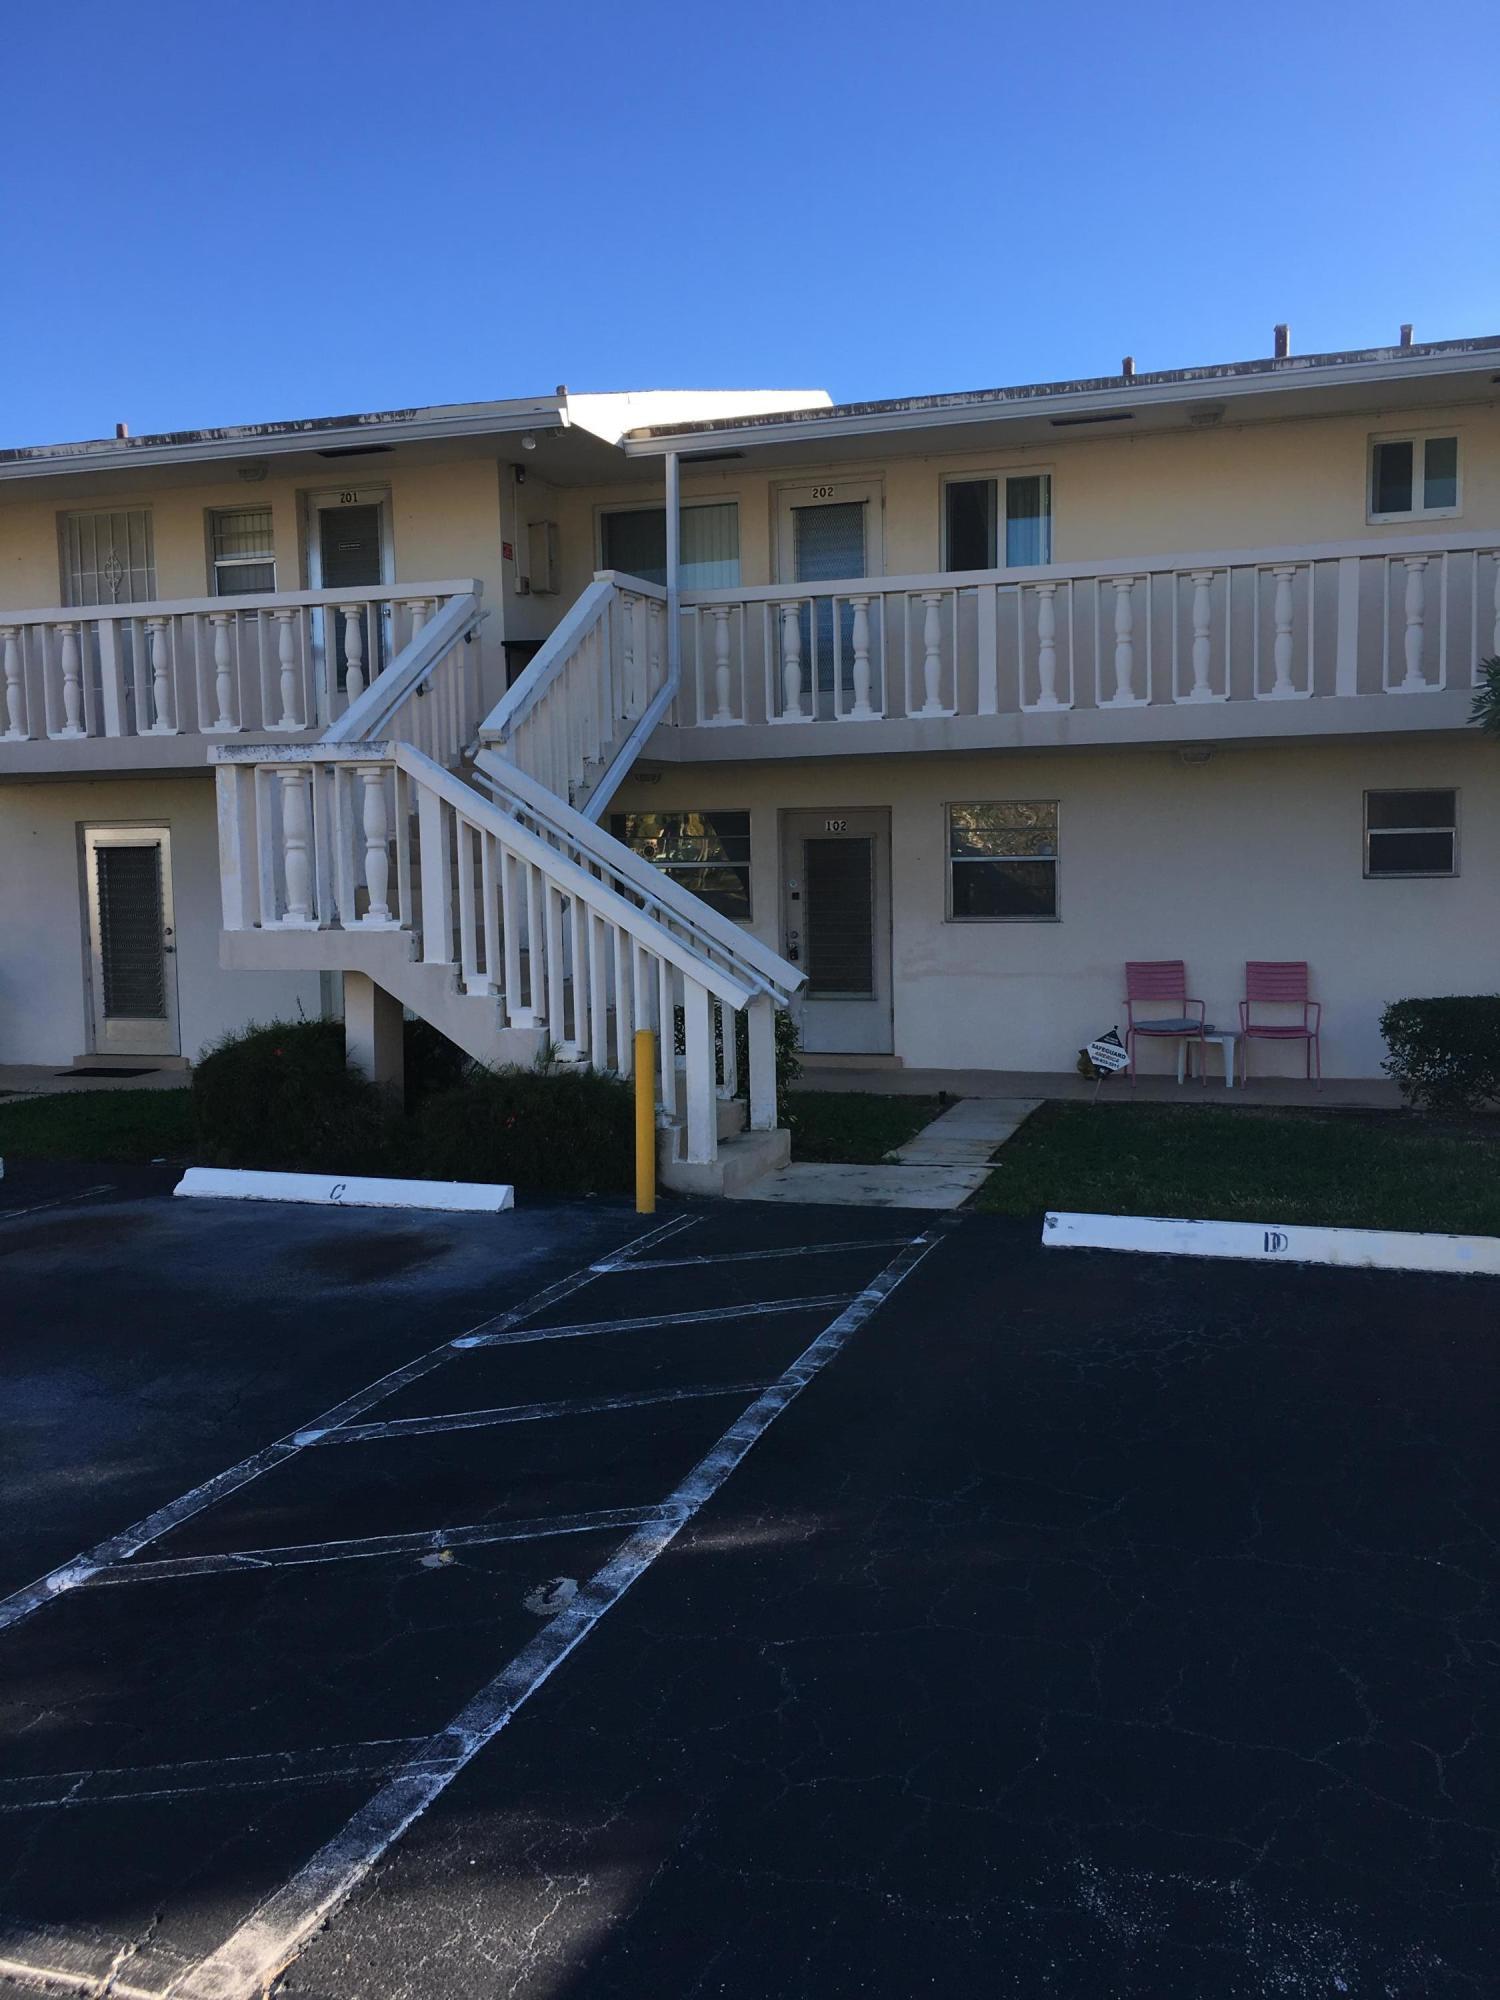 VILLAGE ROYALE CONDO 7 home 2192 NE 1st Way Boynton Beach FL 33435